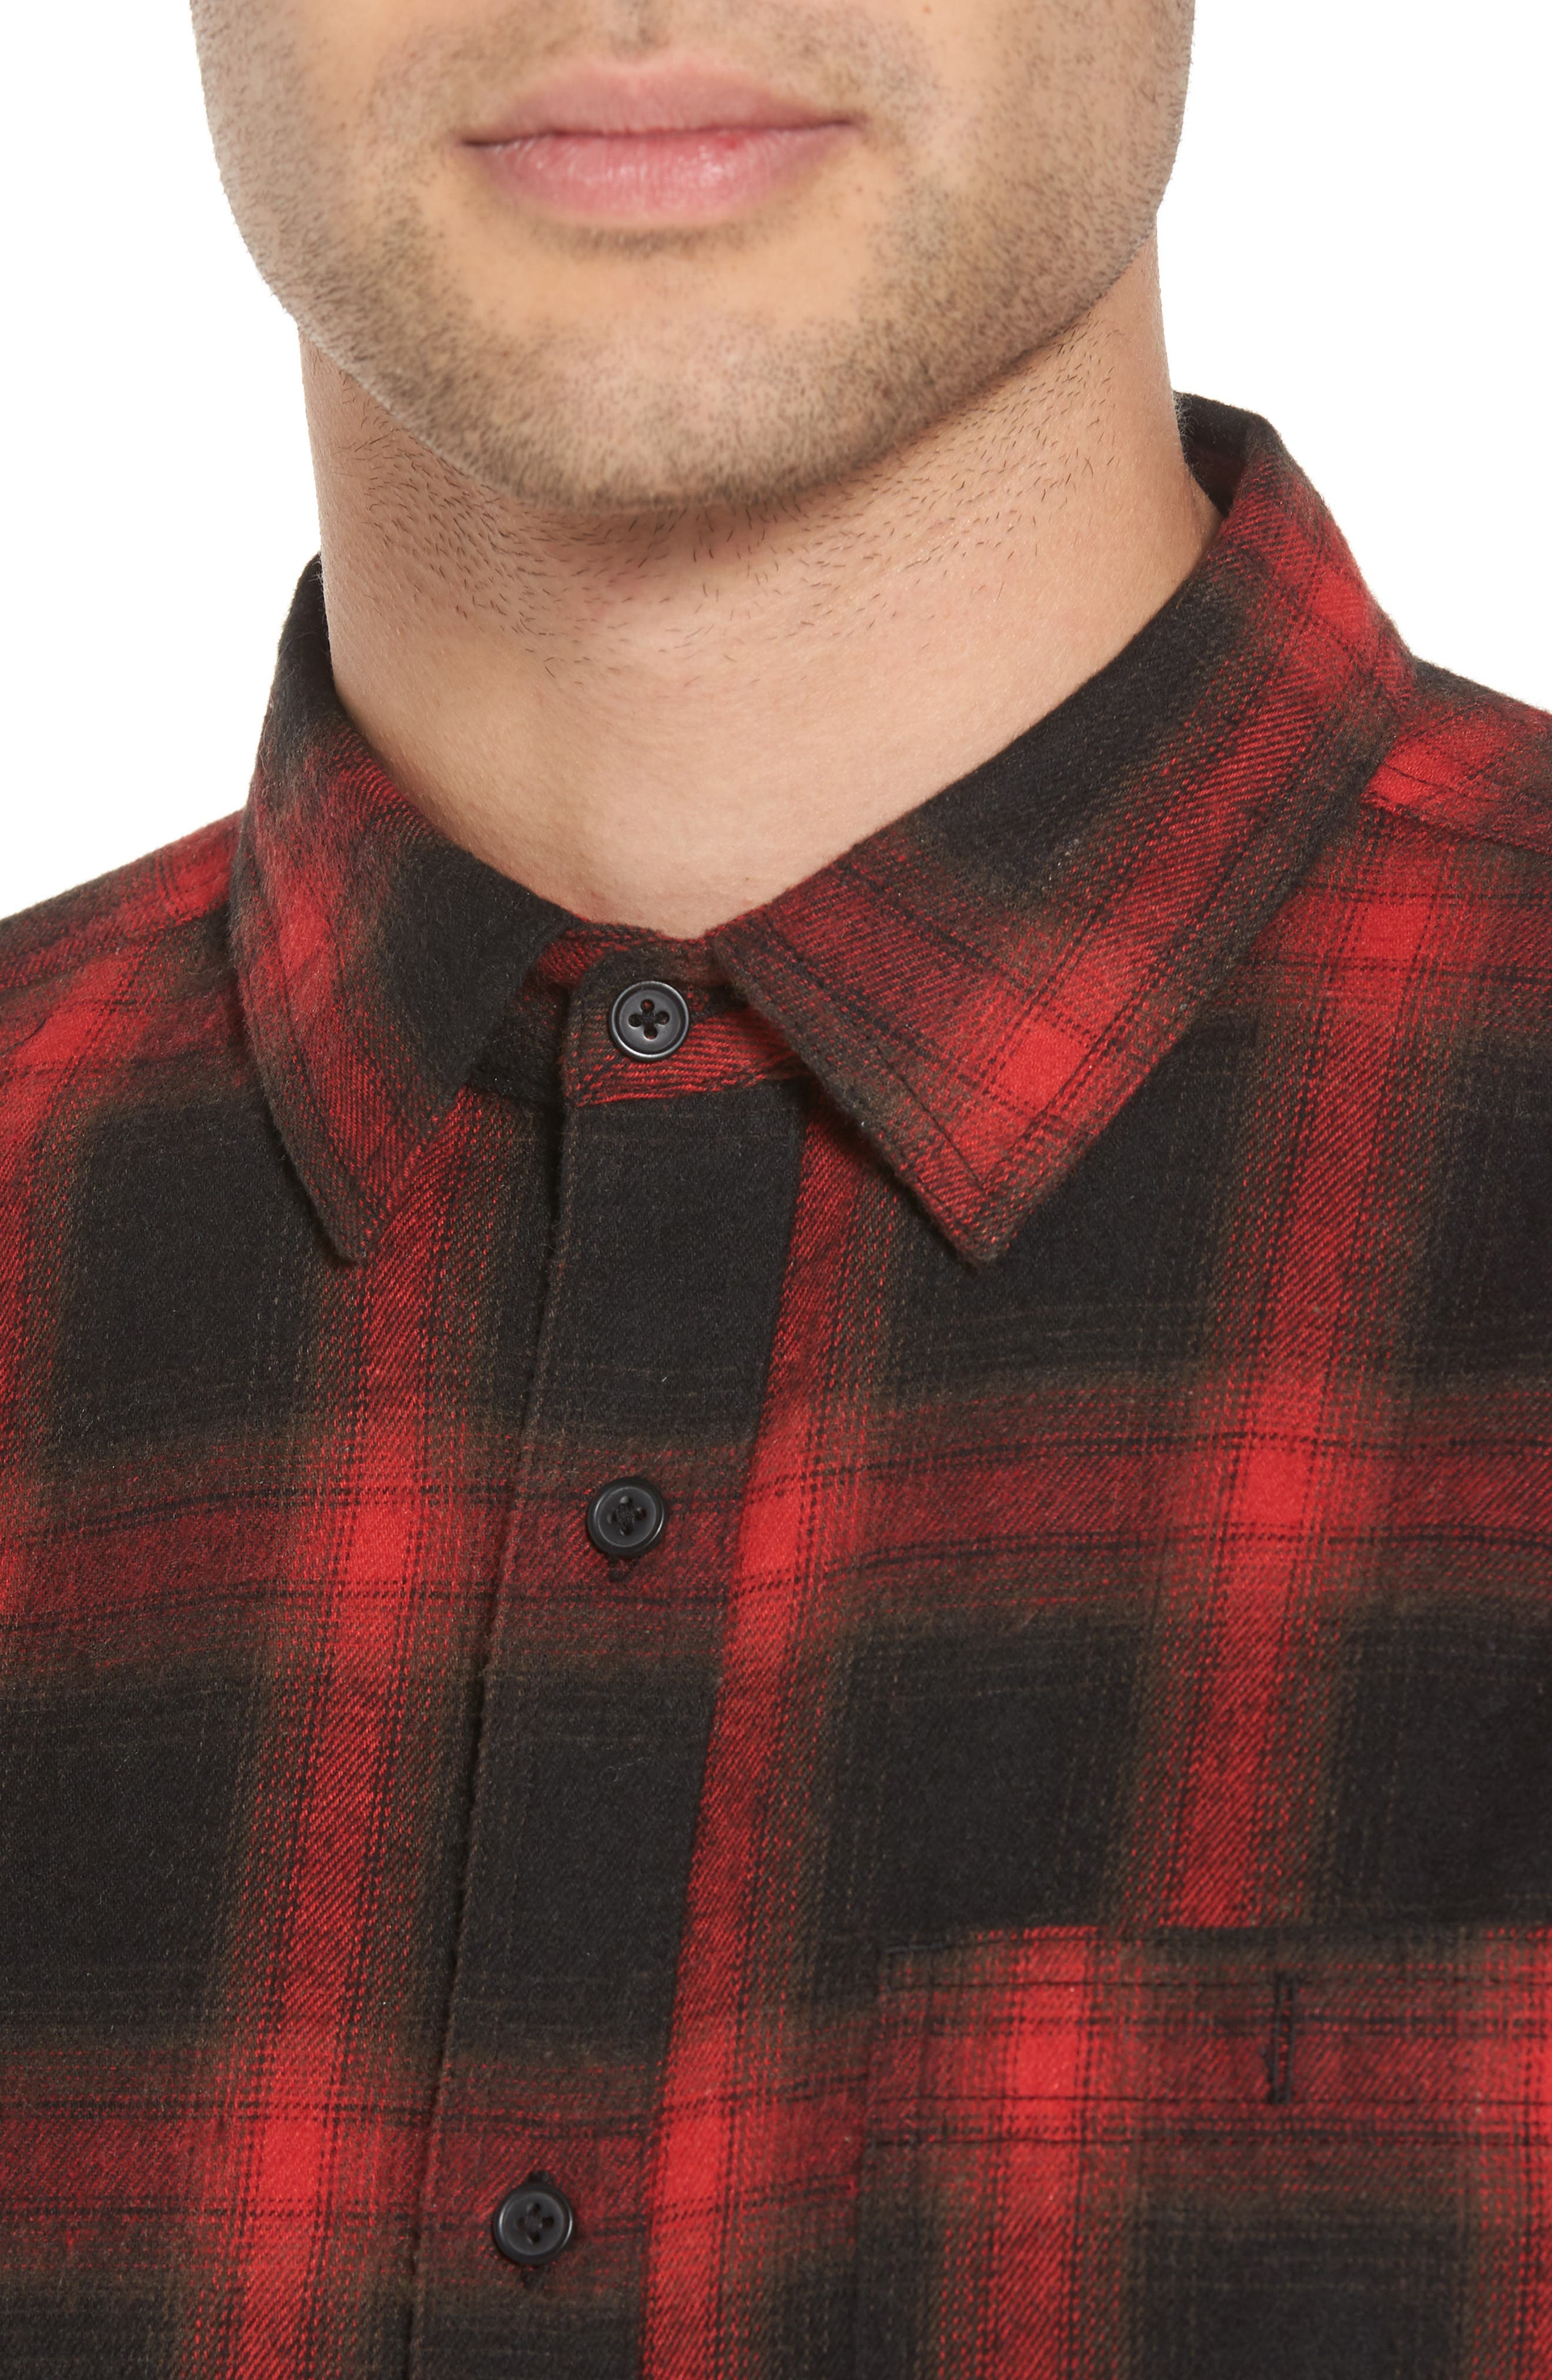 Shredded Plaid Flannel Shirt,                             Alternate thumbnail 4, color,                             001